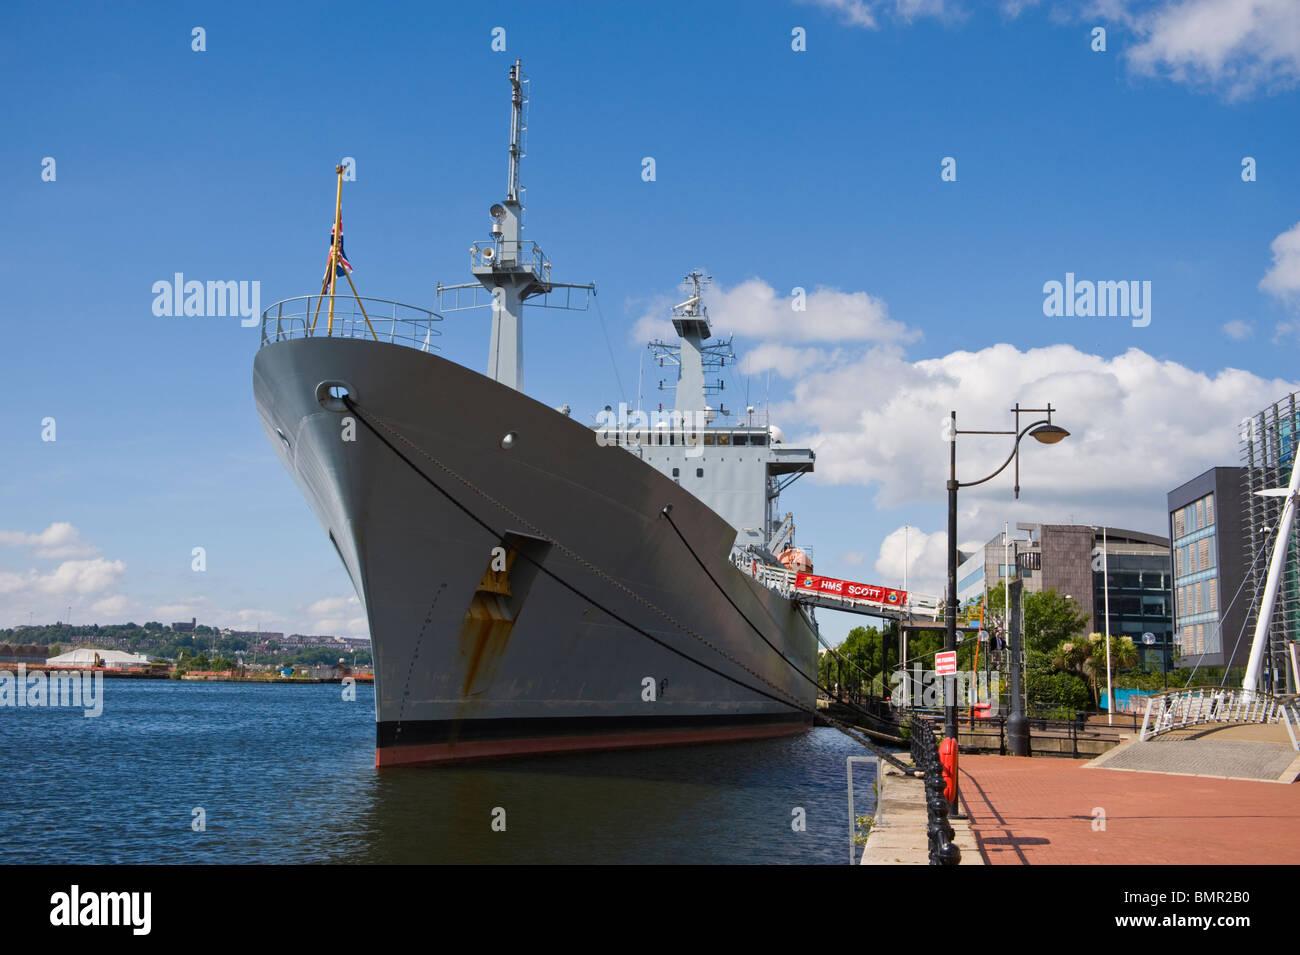 HMS Scott Royal Navy Ocean Survey Vessel moored in Cardiff Bay South Wales UK Stock Photo